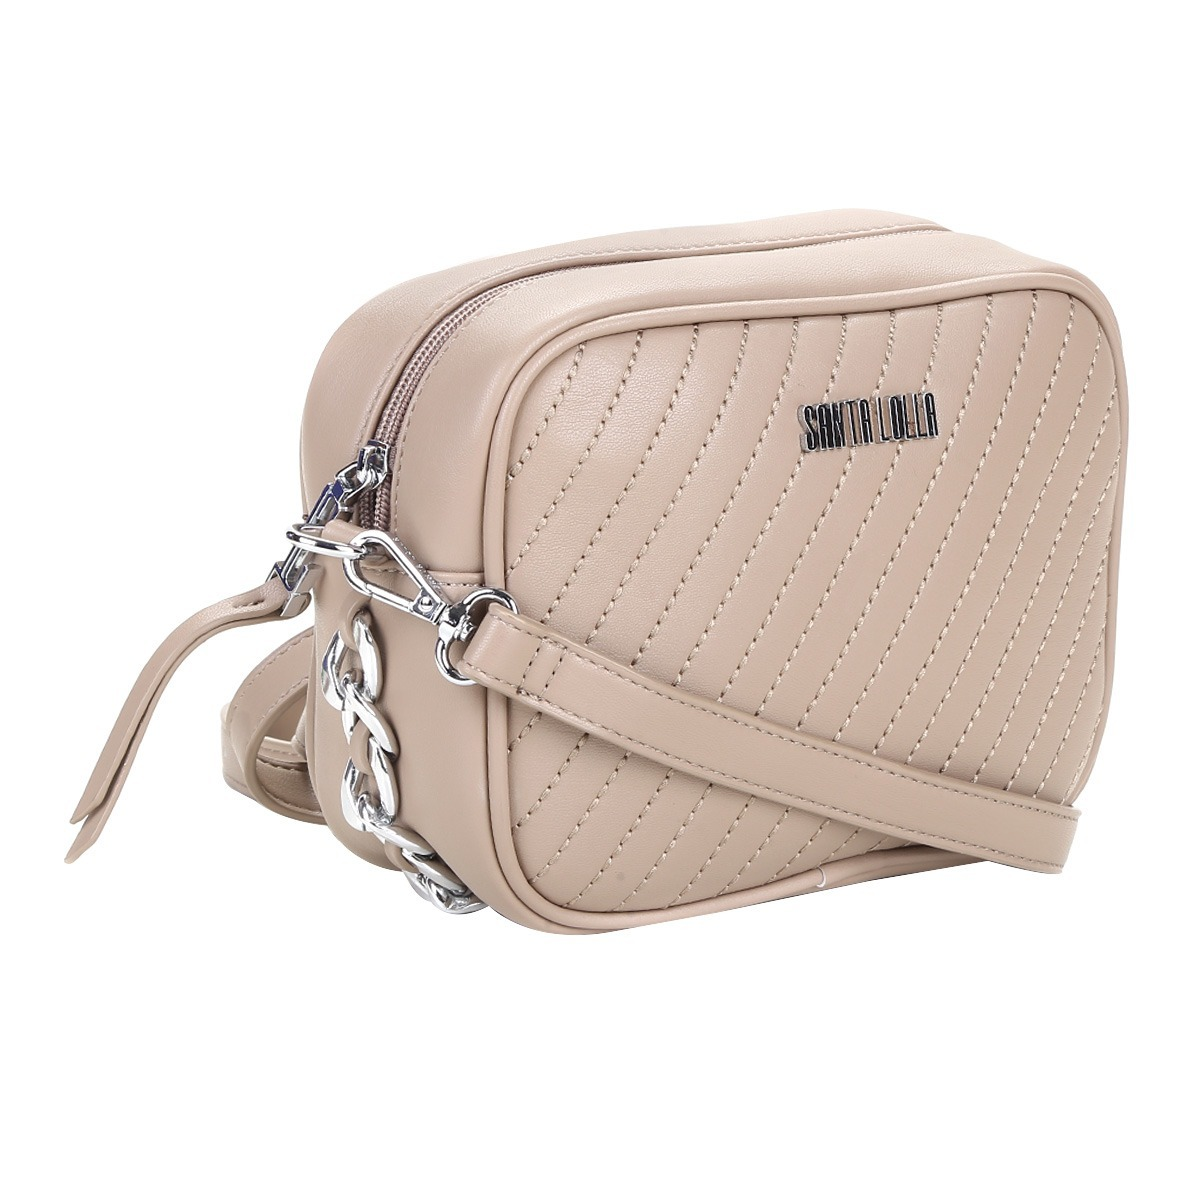 5154c5601 bolsa santa lolla mini bag transversal na cor fendi - 1aed. Carregando zoom.